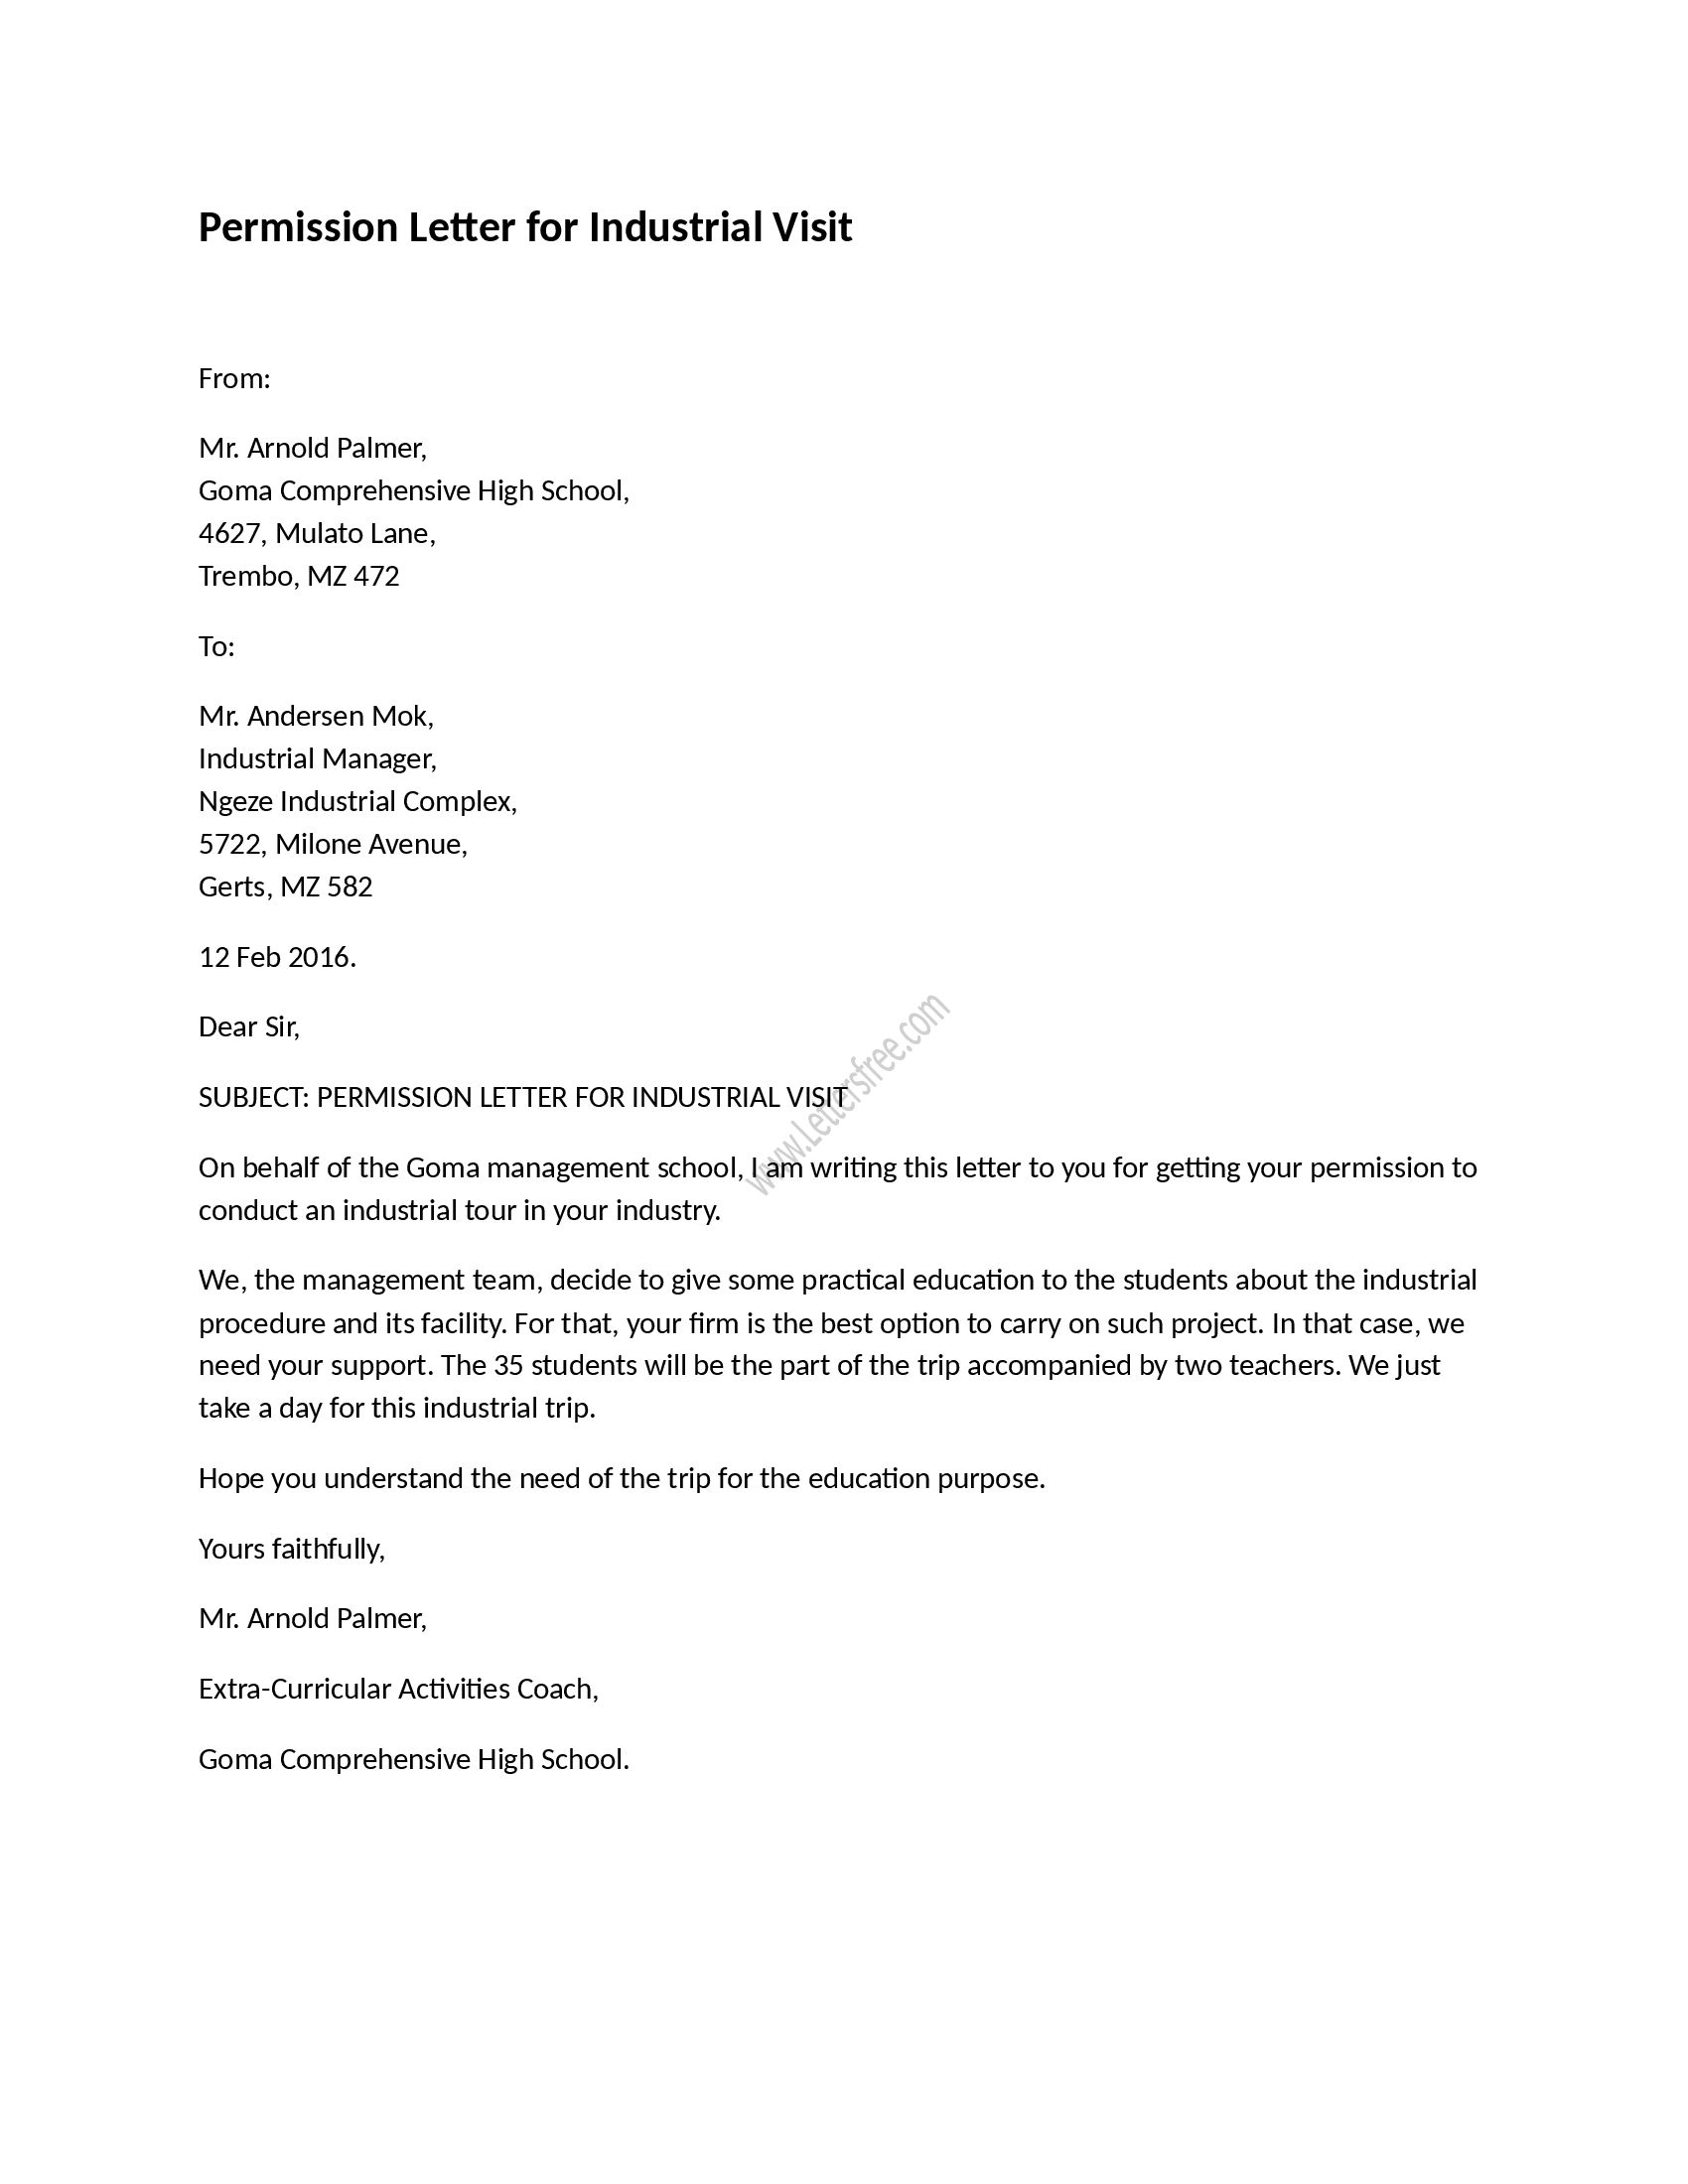 18 Sample Permission Letters ideas  letters, free lettering, lettering